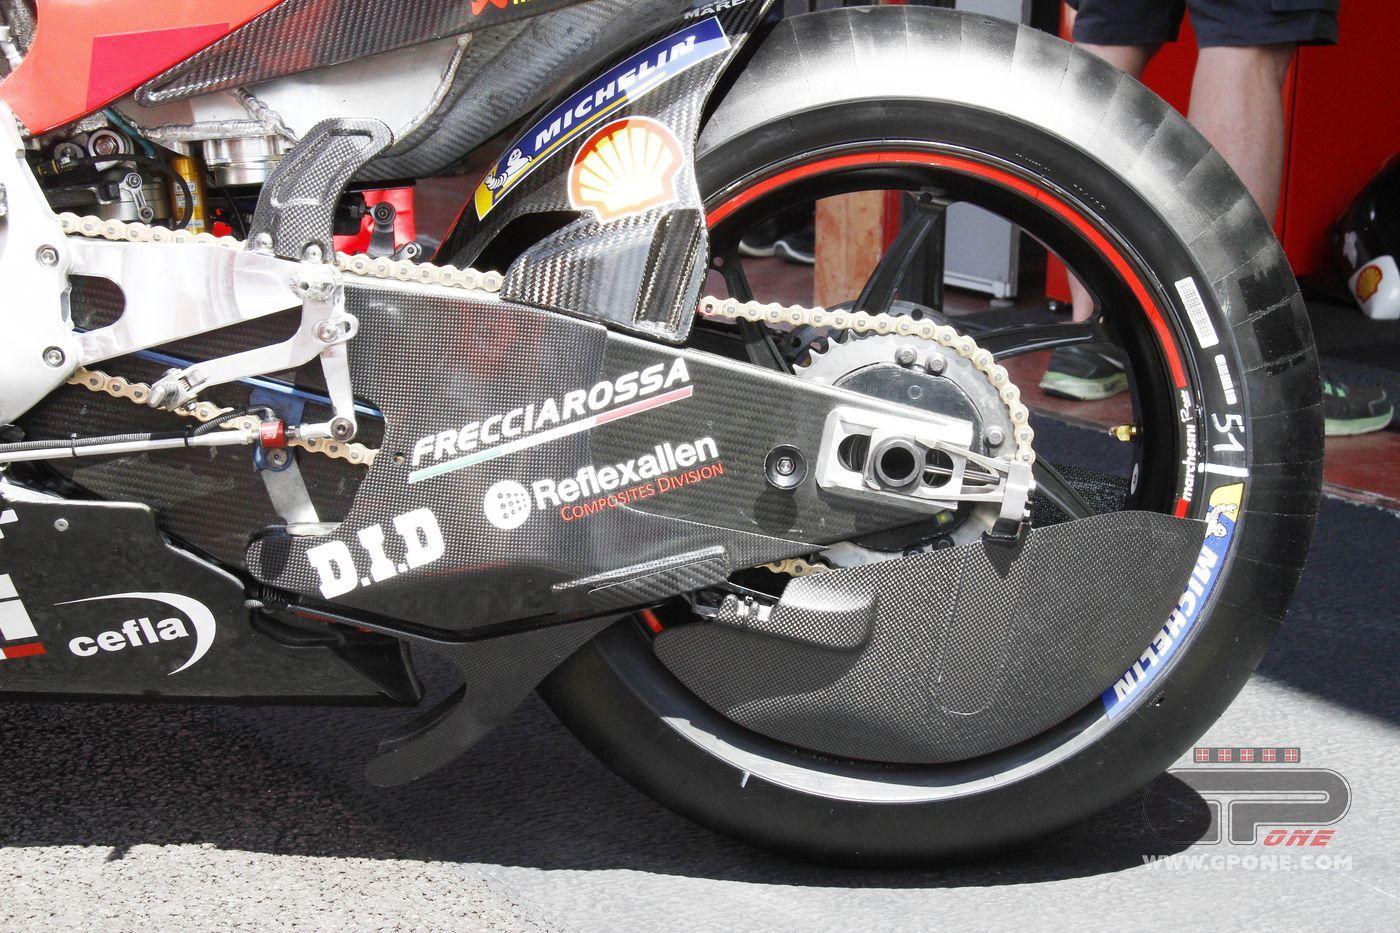 Motogp Ducati Closes The Wheel New Aerodynamics On Pirro S Bike Gpone Com